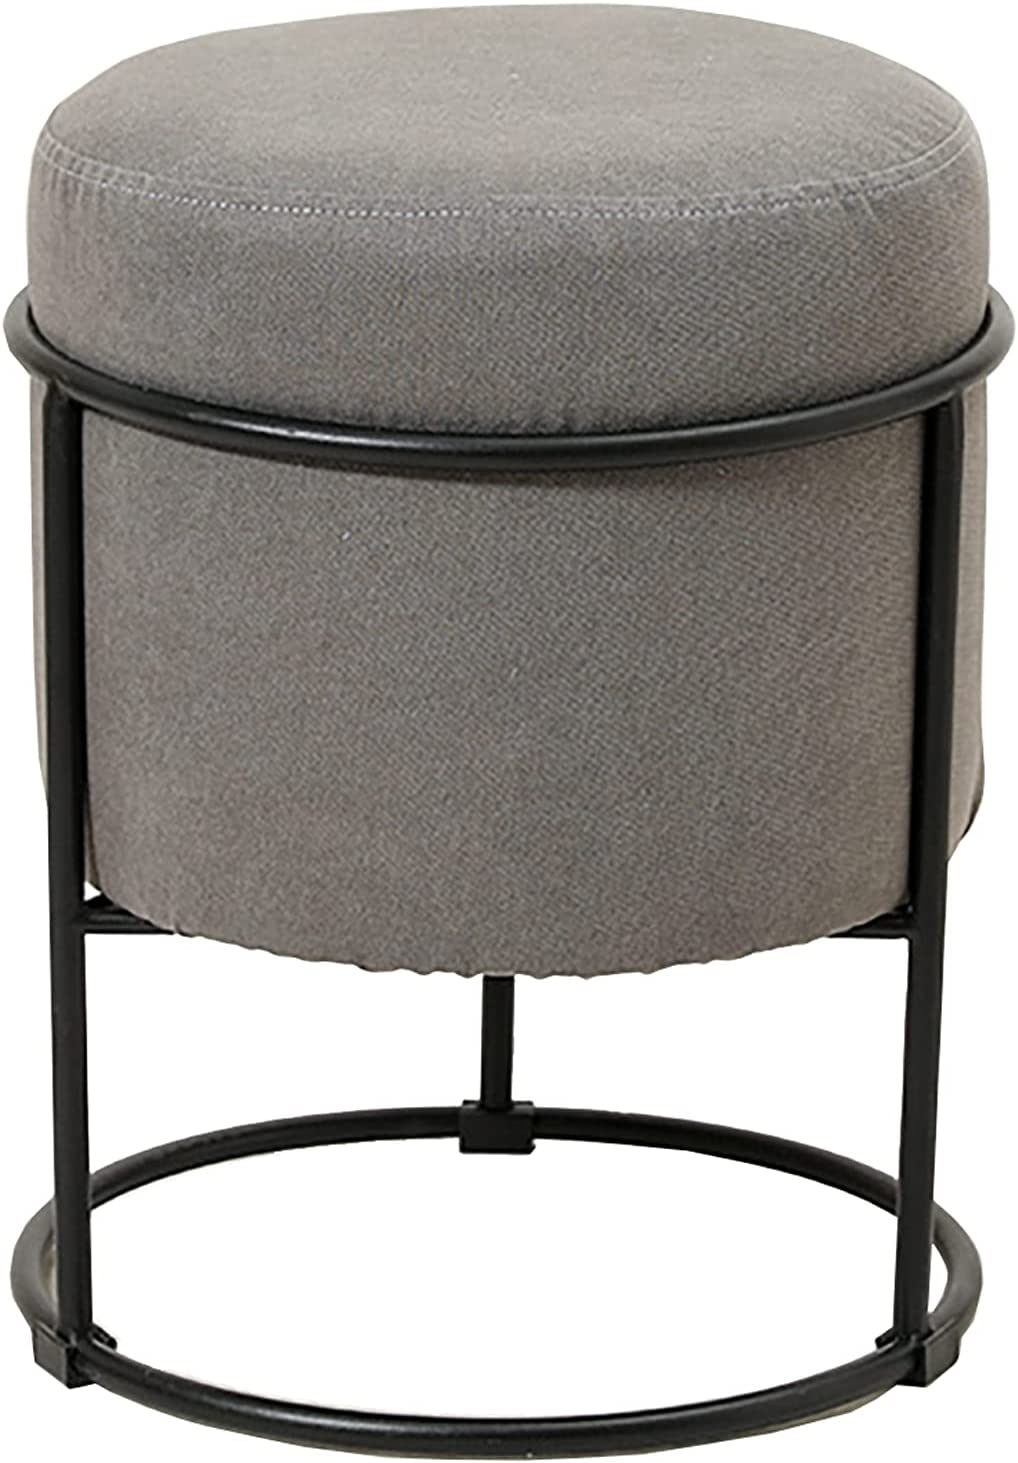 ZHAORU Cotton Regular dealer and Linen Portland Mall Ottoman Round Footstool Table Mod Side -